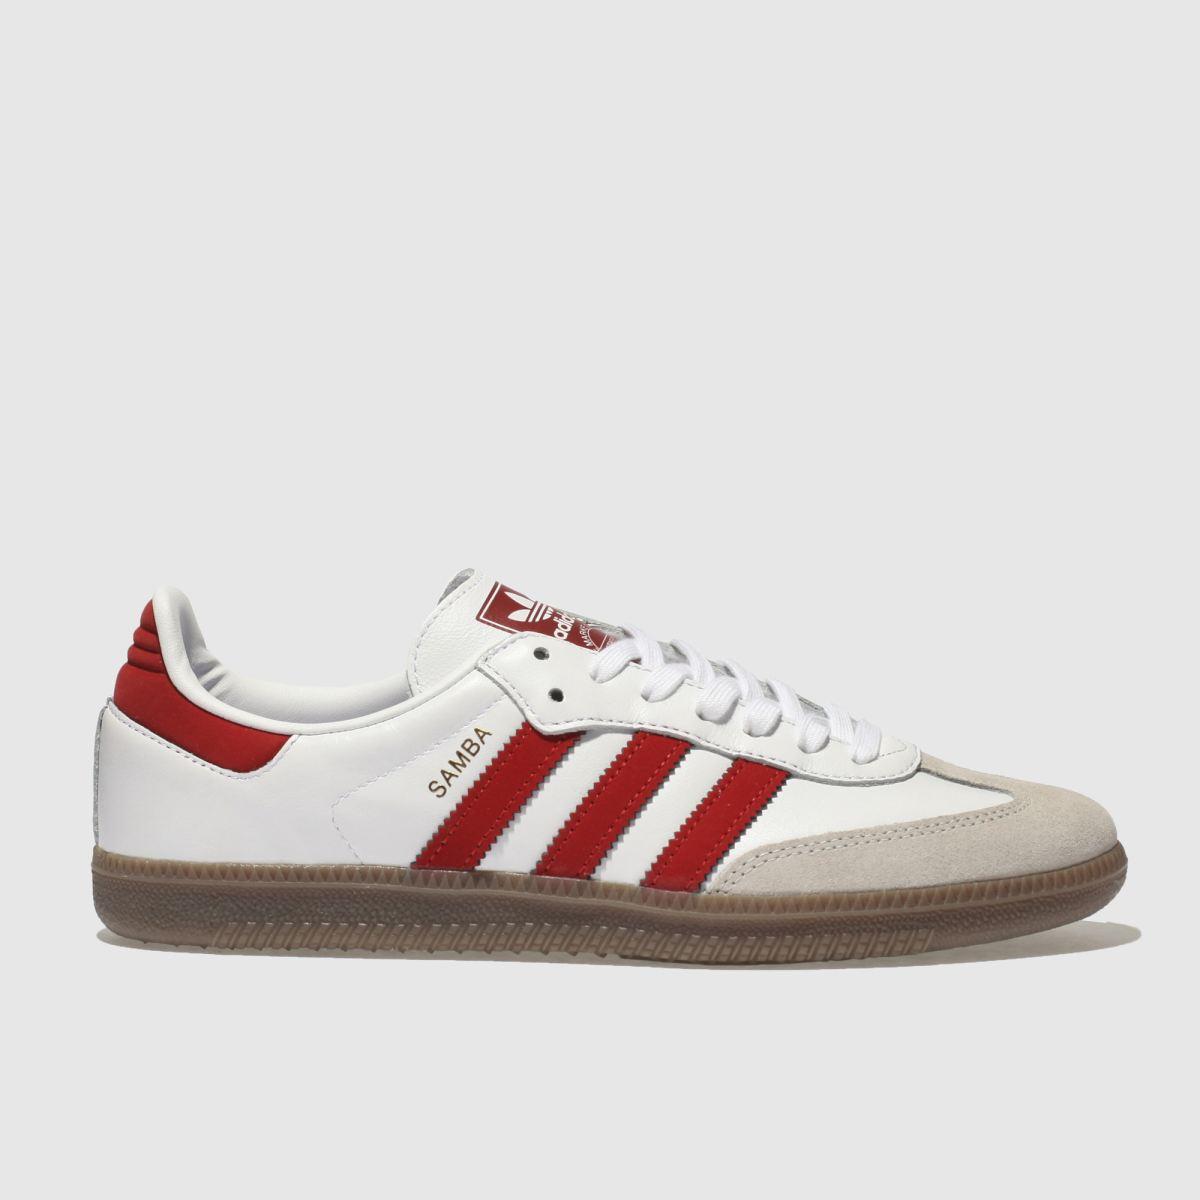 Adidas White & Red Samba Og Trainers